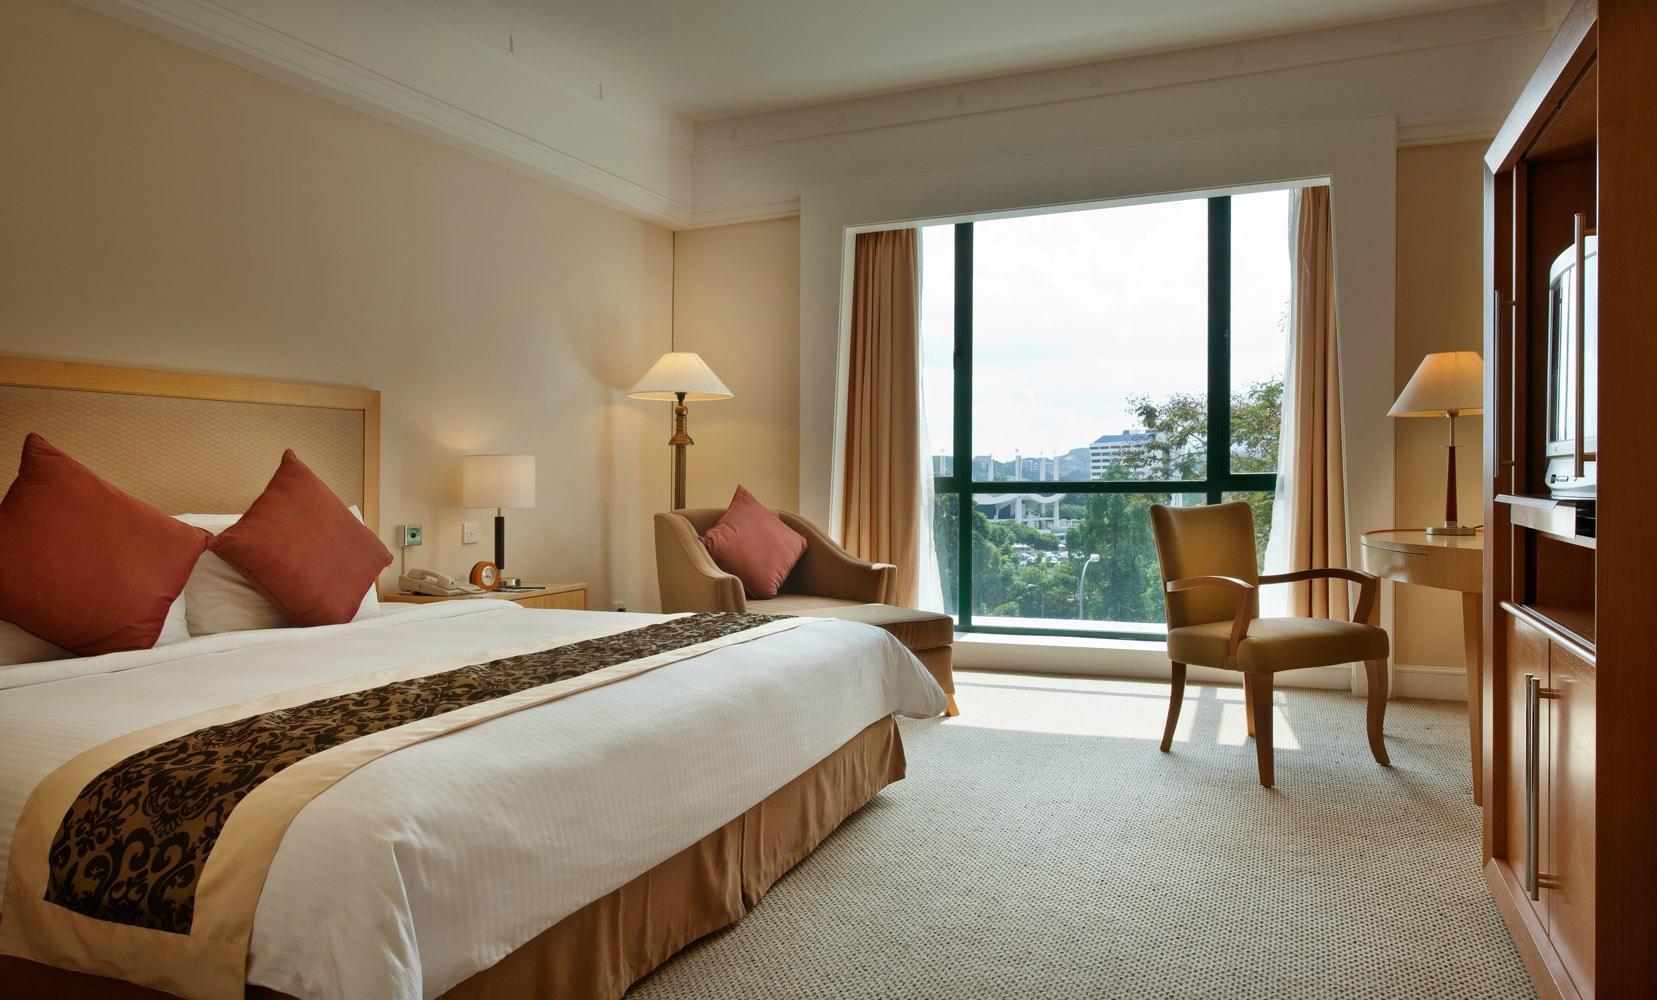 The Royale Bintang Resort & Spa Seremban